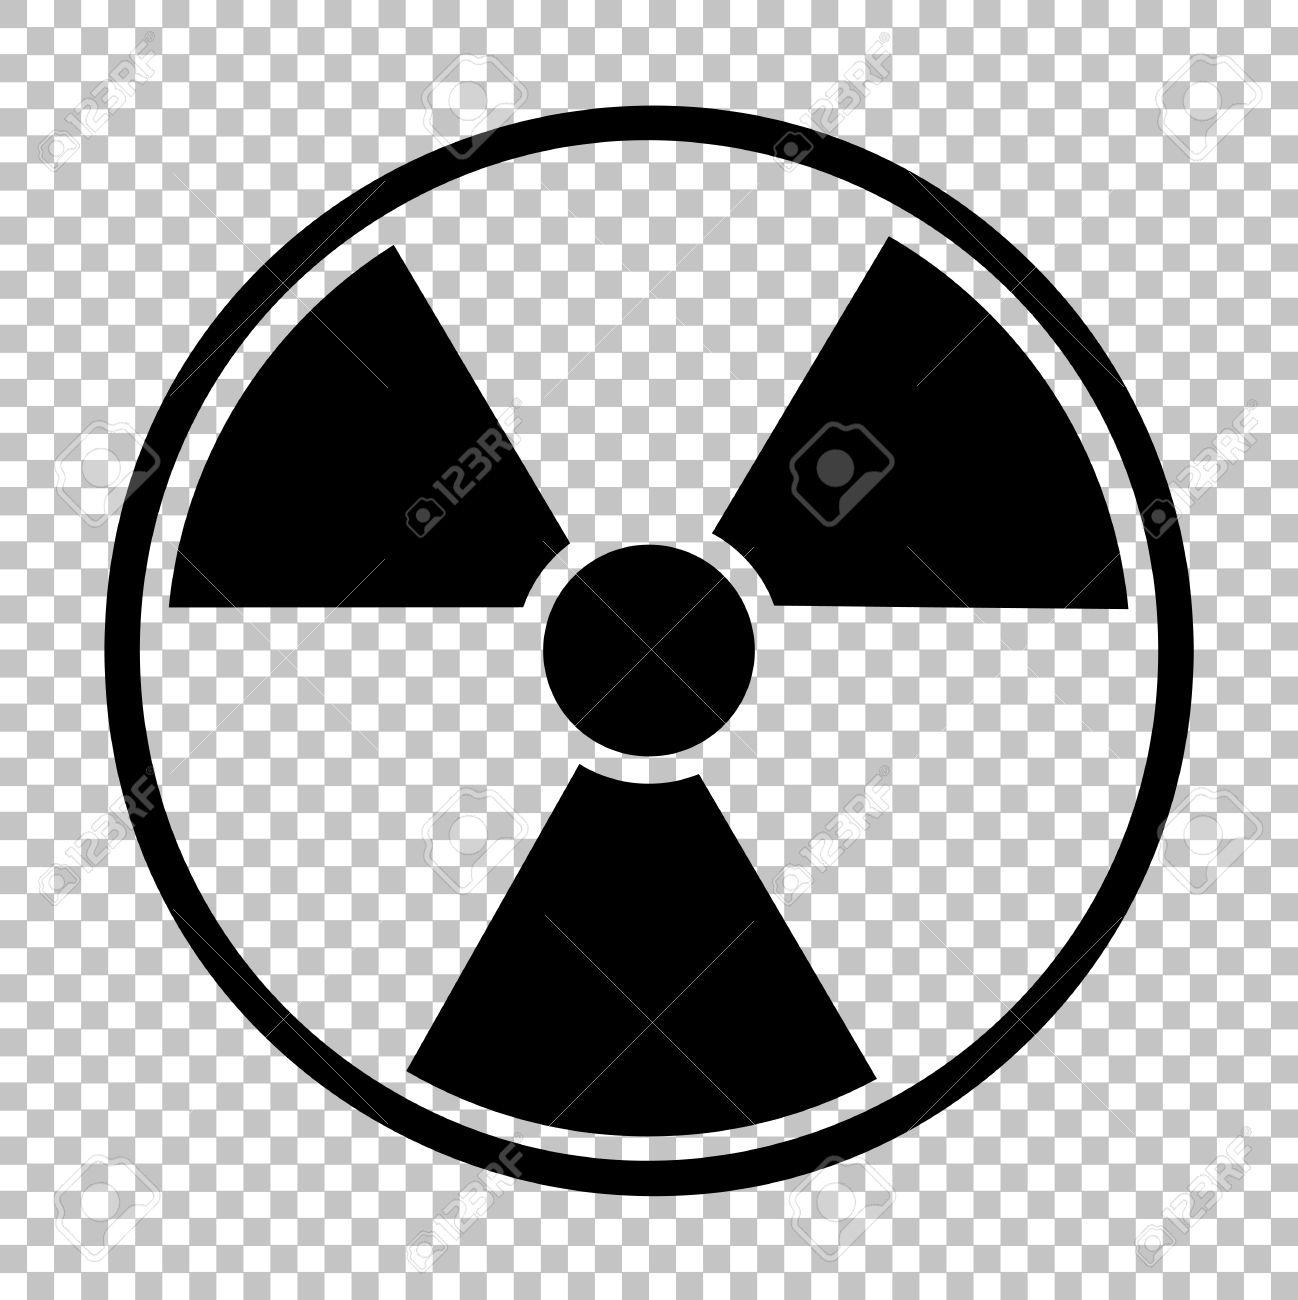 Radiation Round Sign. Flat Style Icon On Transparent Background.